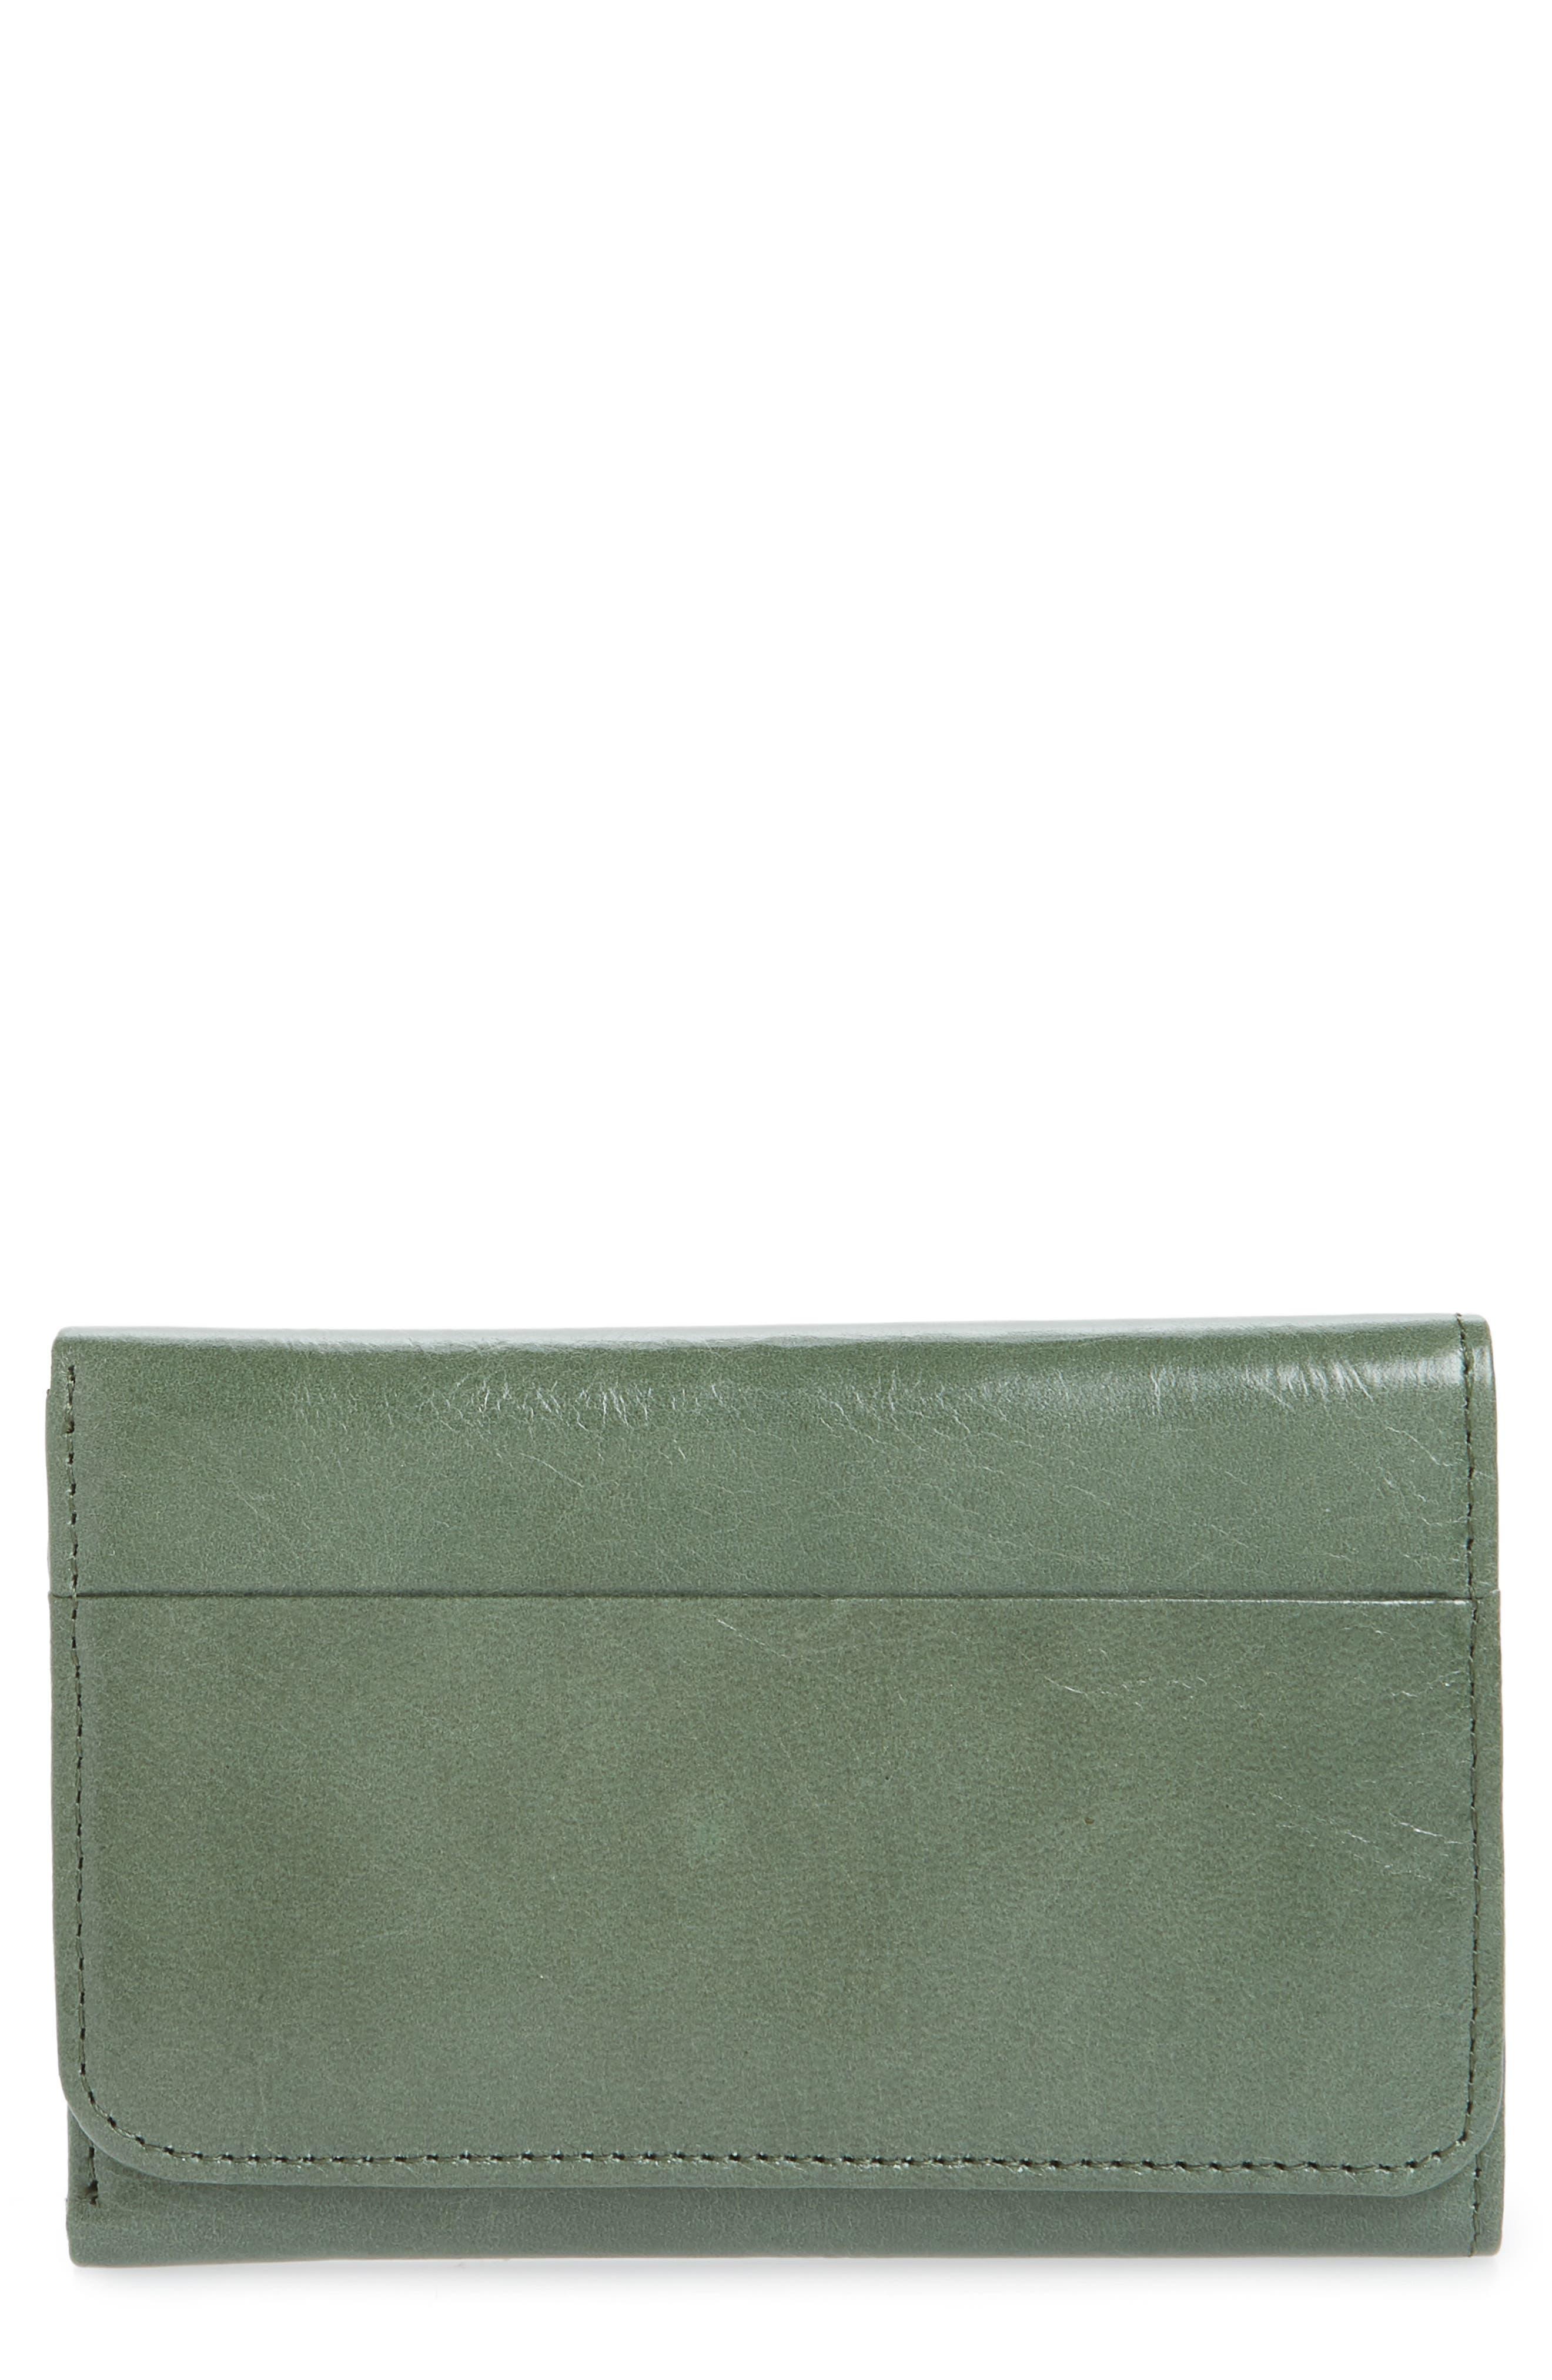 Jill Trifold Wallet,                         Main,                         color, MOSS